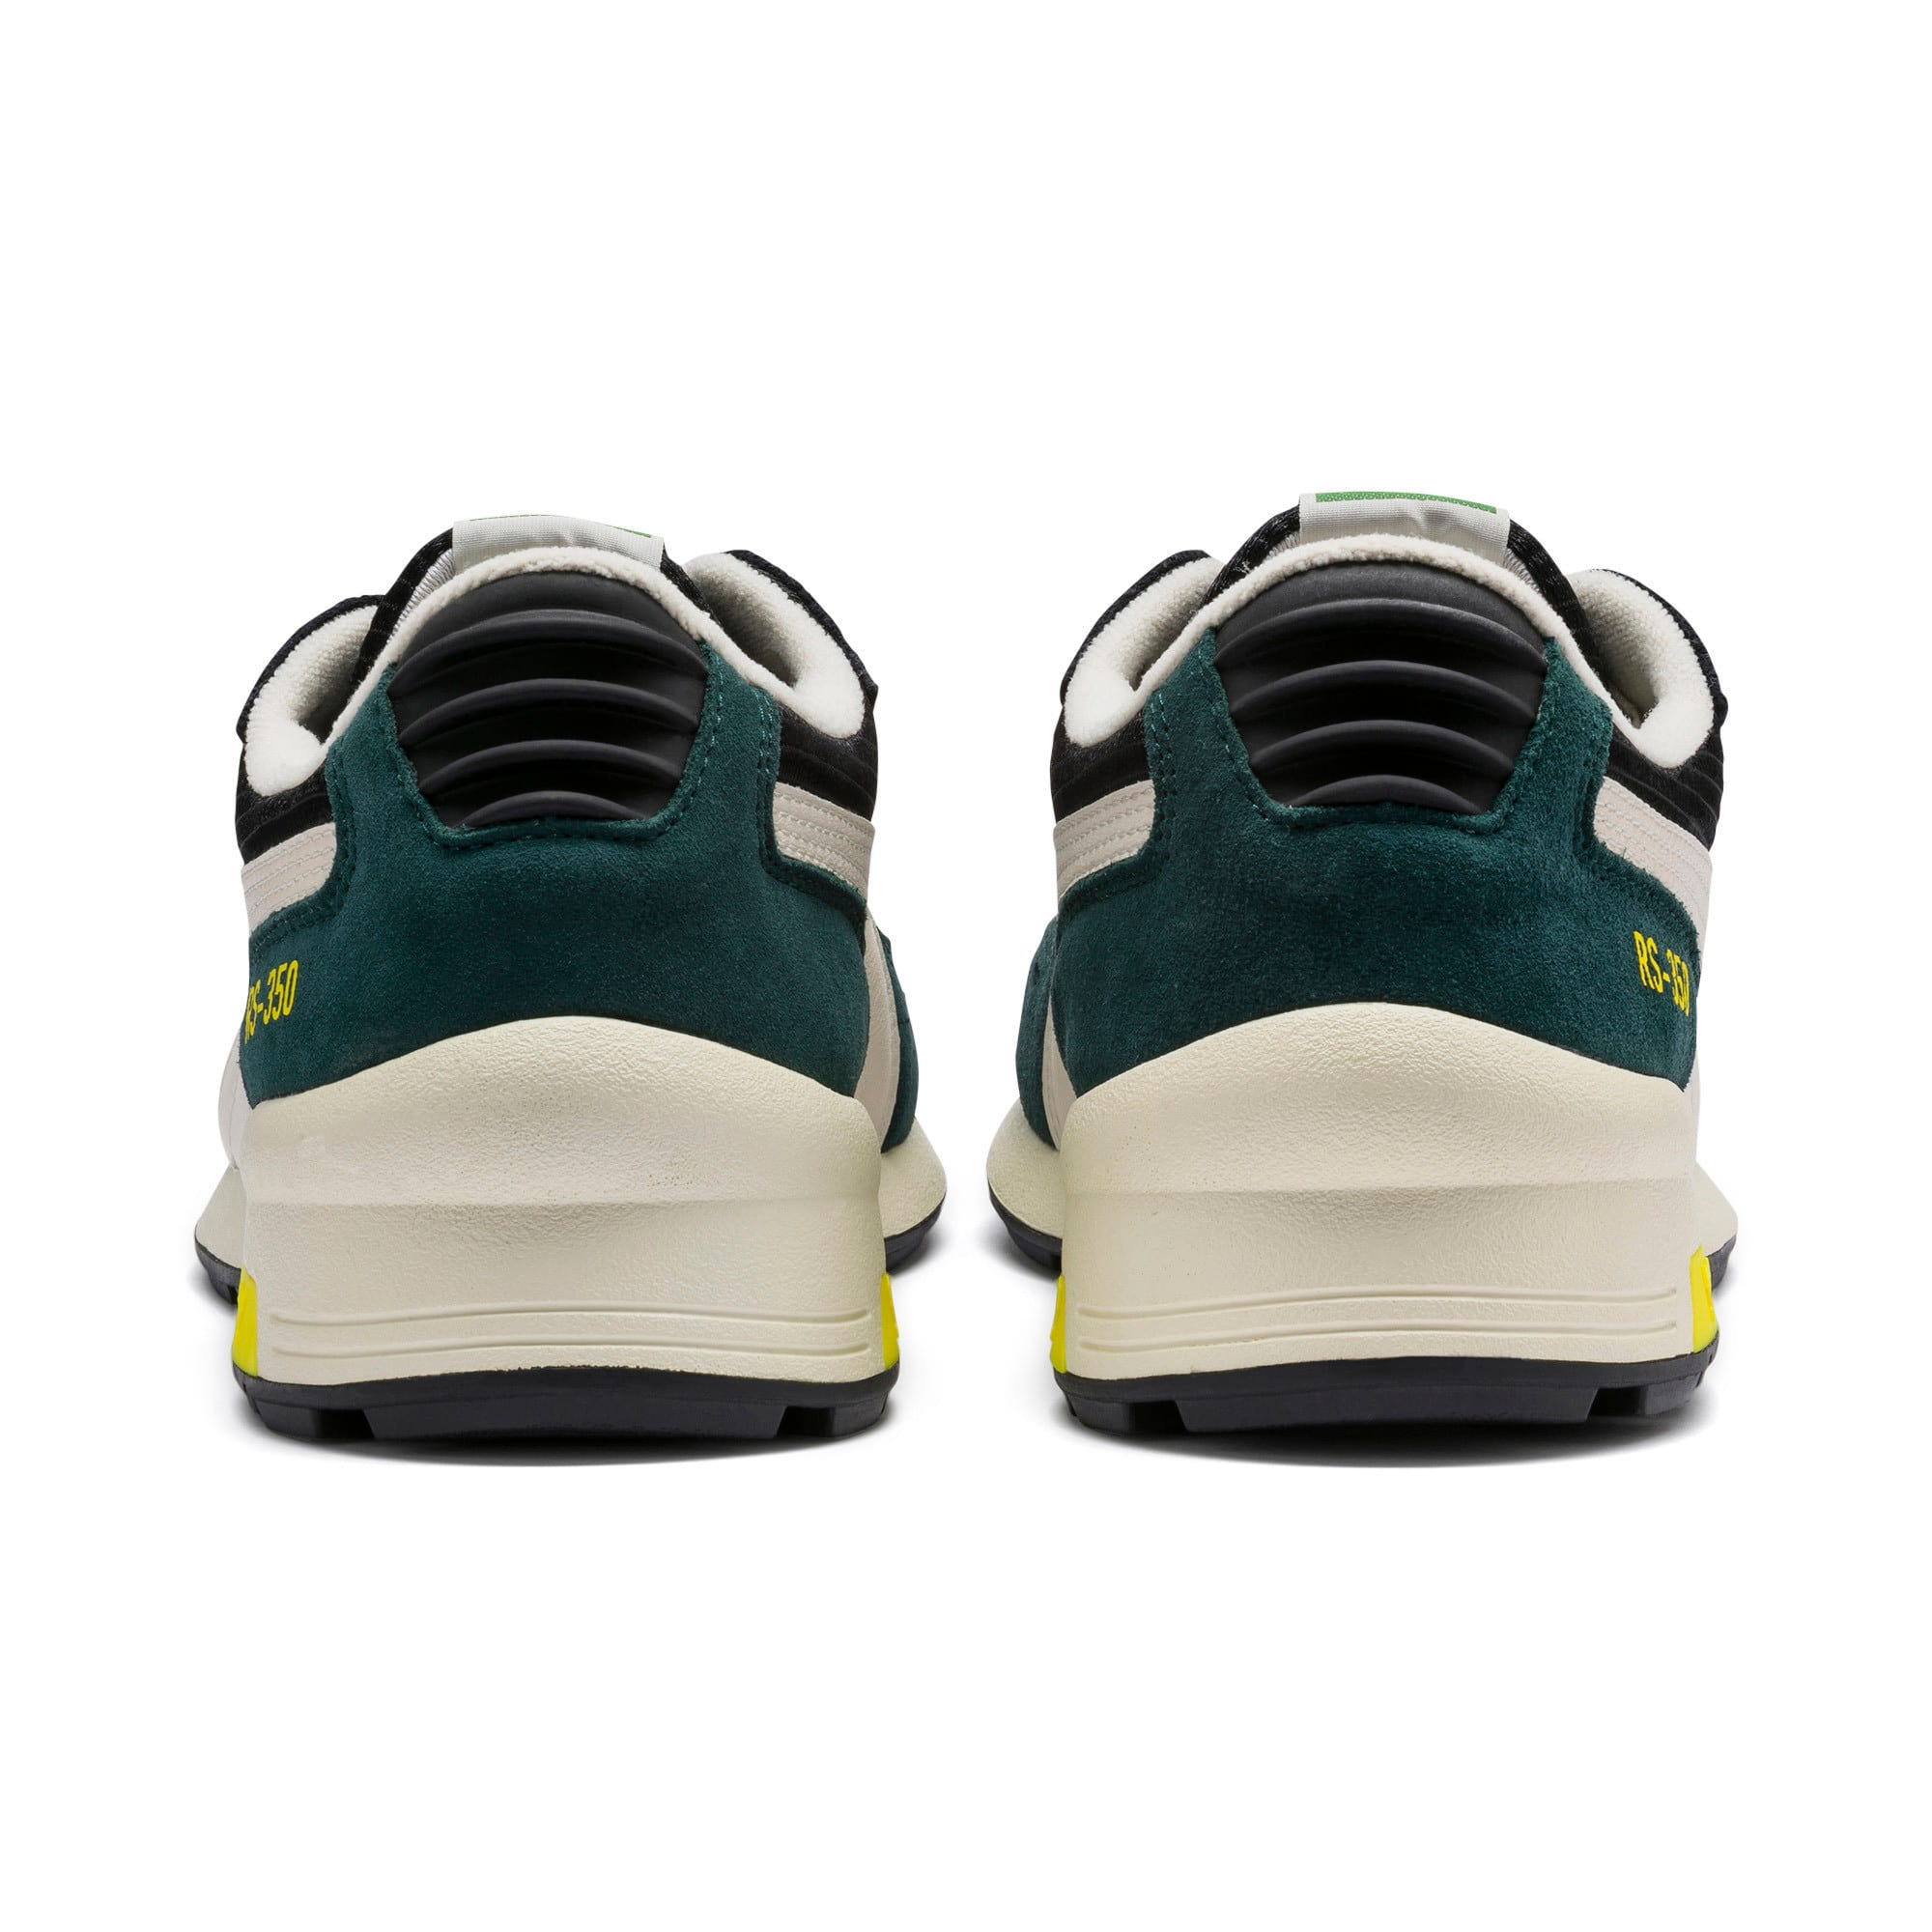 Thumbnail 4 of RS-350 OG Men's Sneakers, Puma Black-Ponderosa Pine, medium